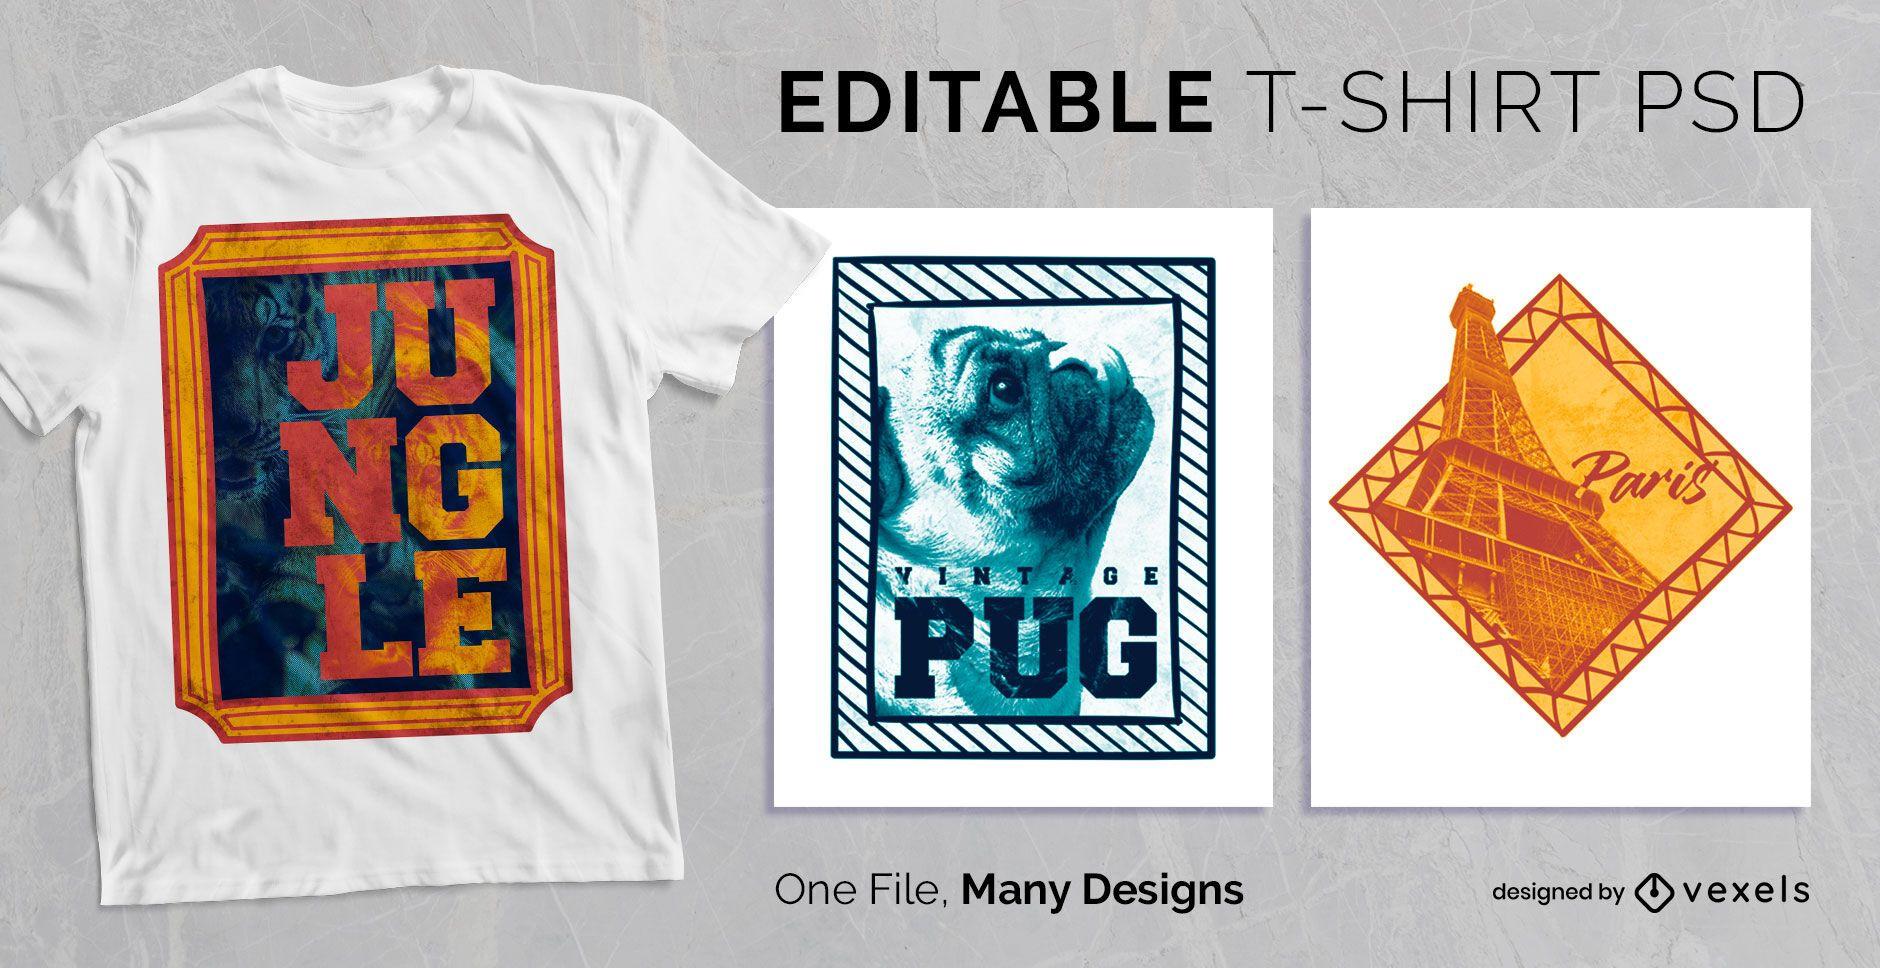 Colorful Frame Text T-shirt Design PSD